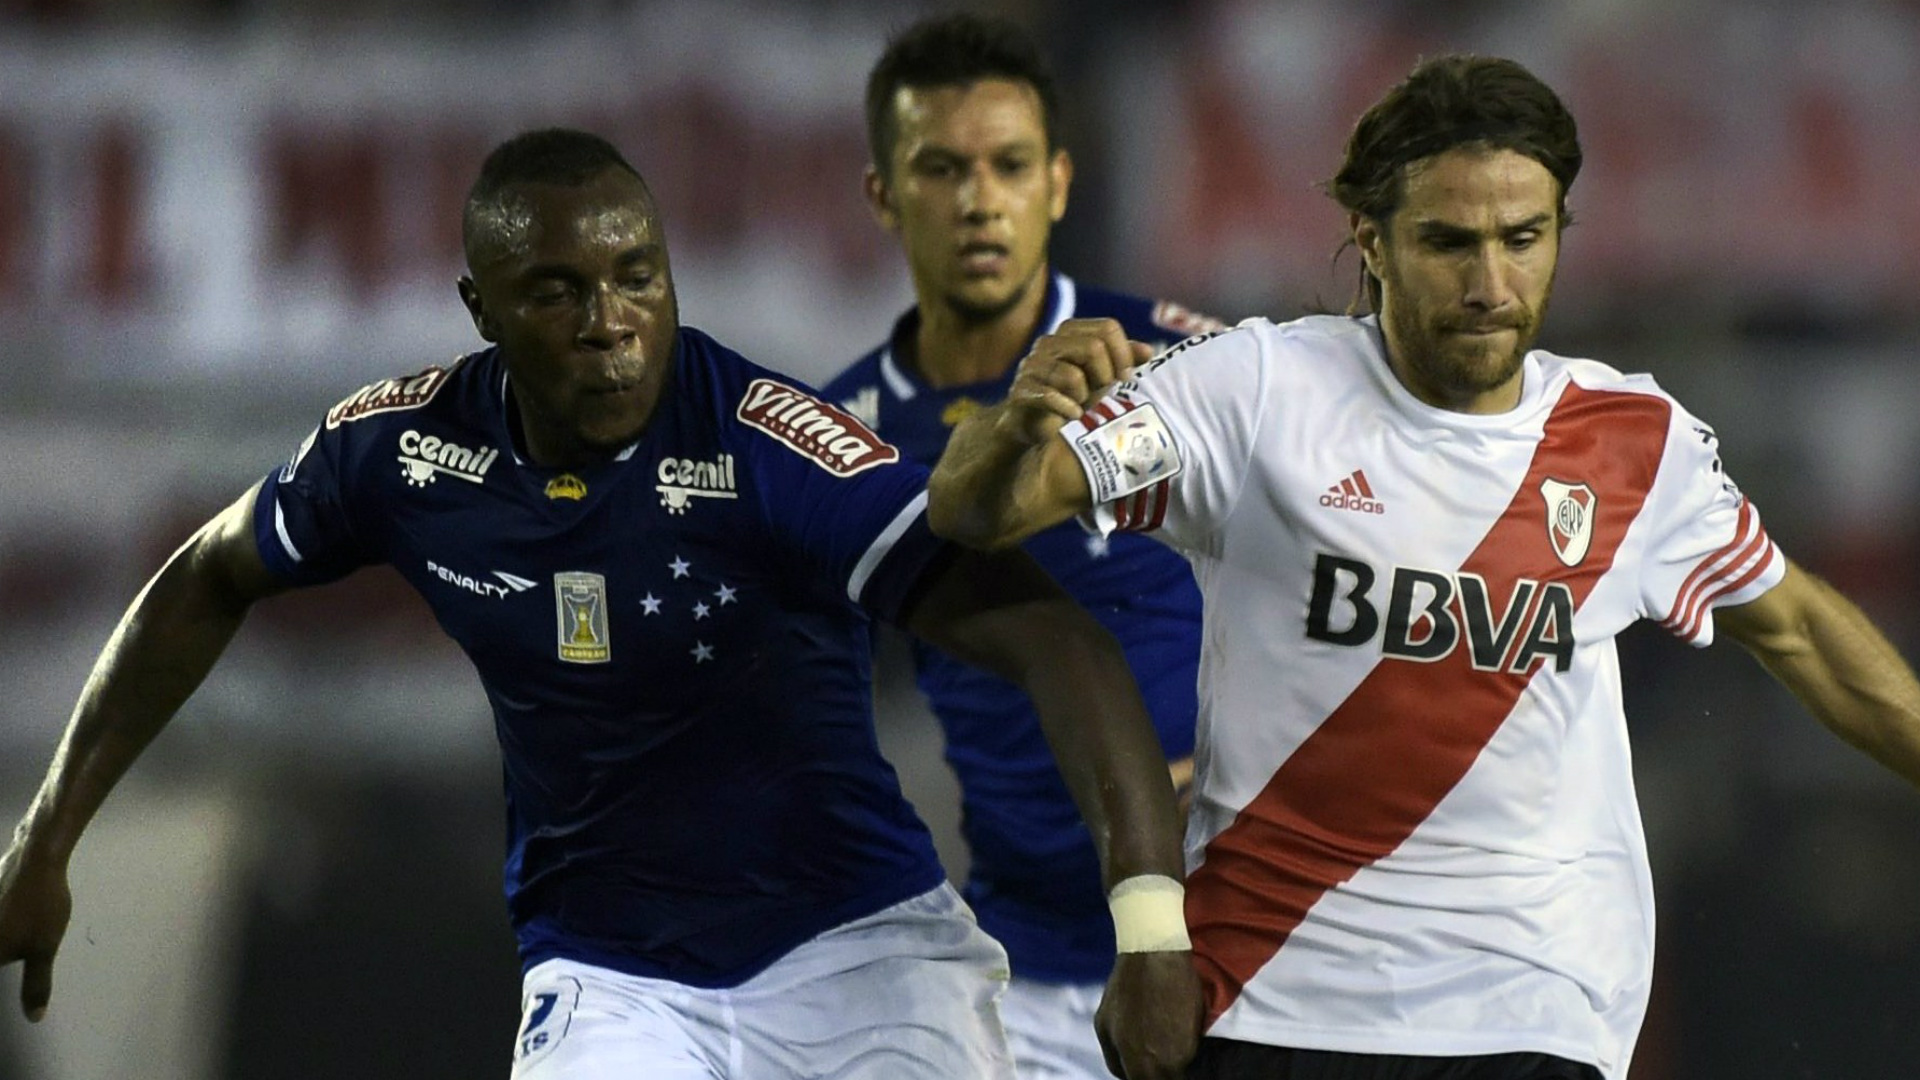 Ponzio River Cruzeiro Copa Libertadores 2015